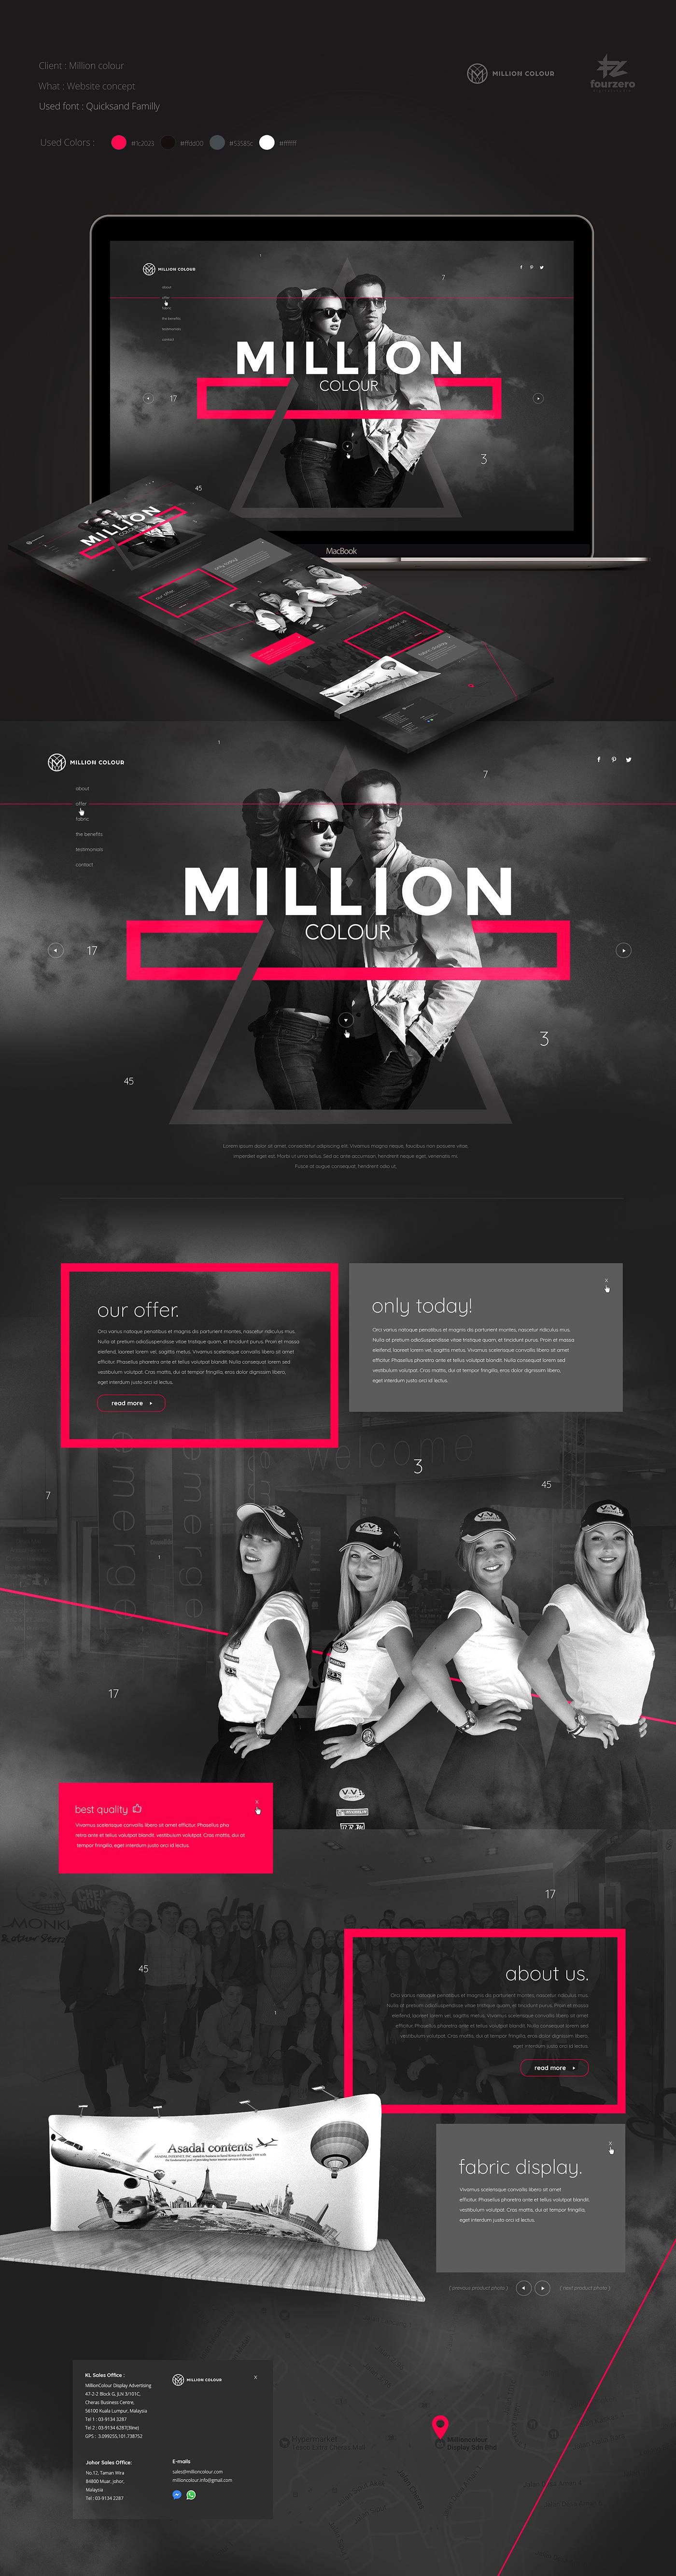 UI Web design minimal elegant bogucki modern million fourzero dark